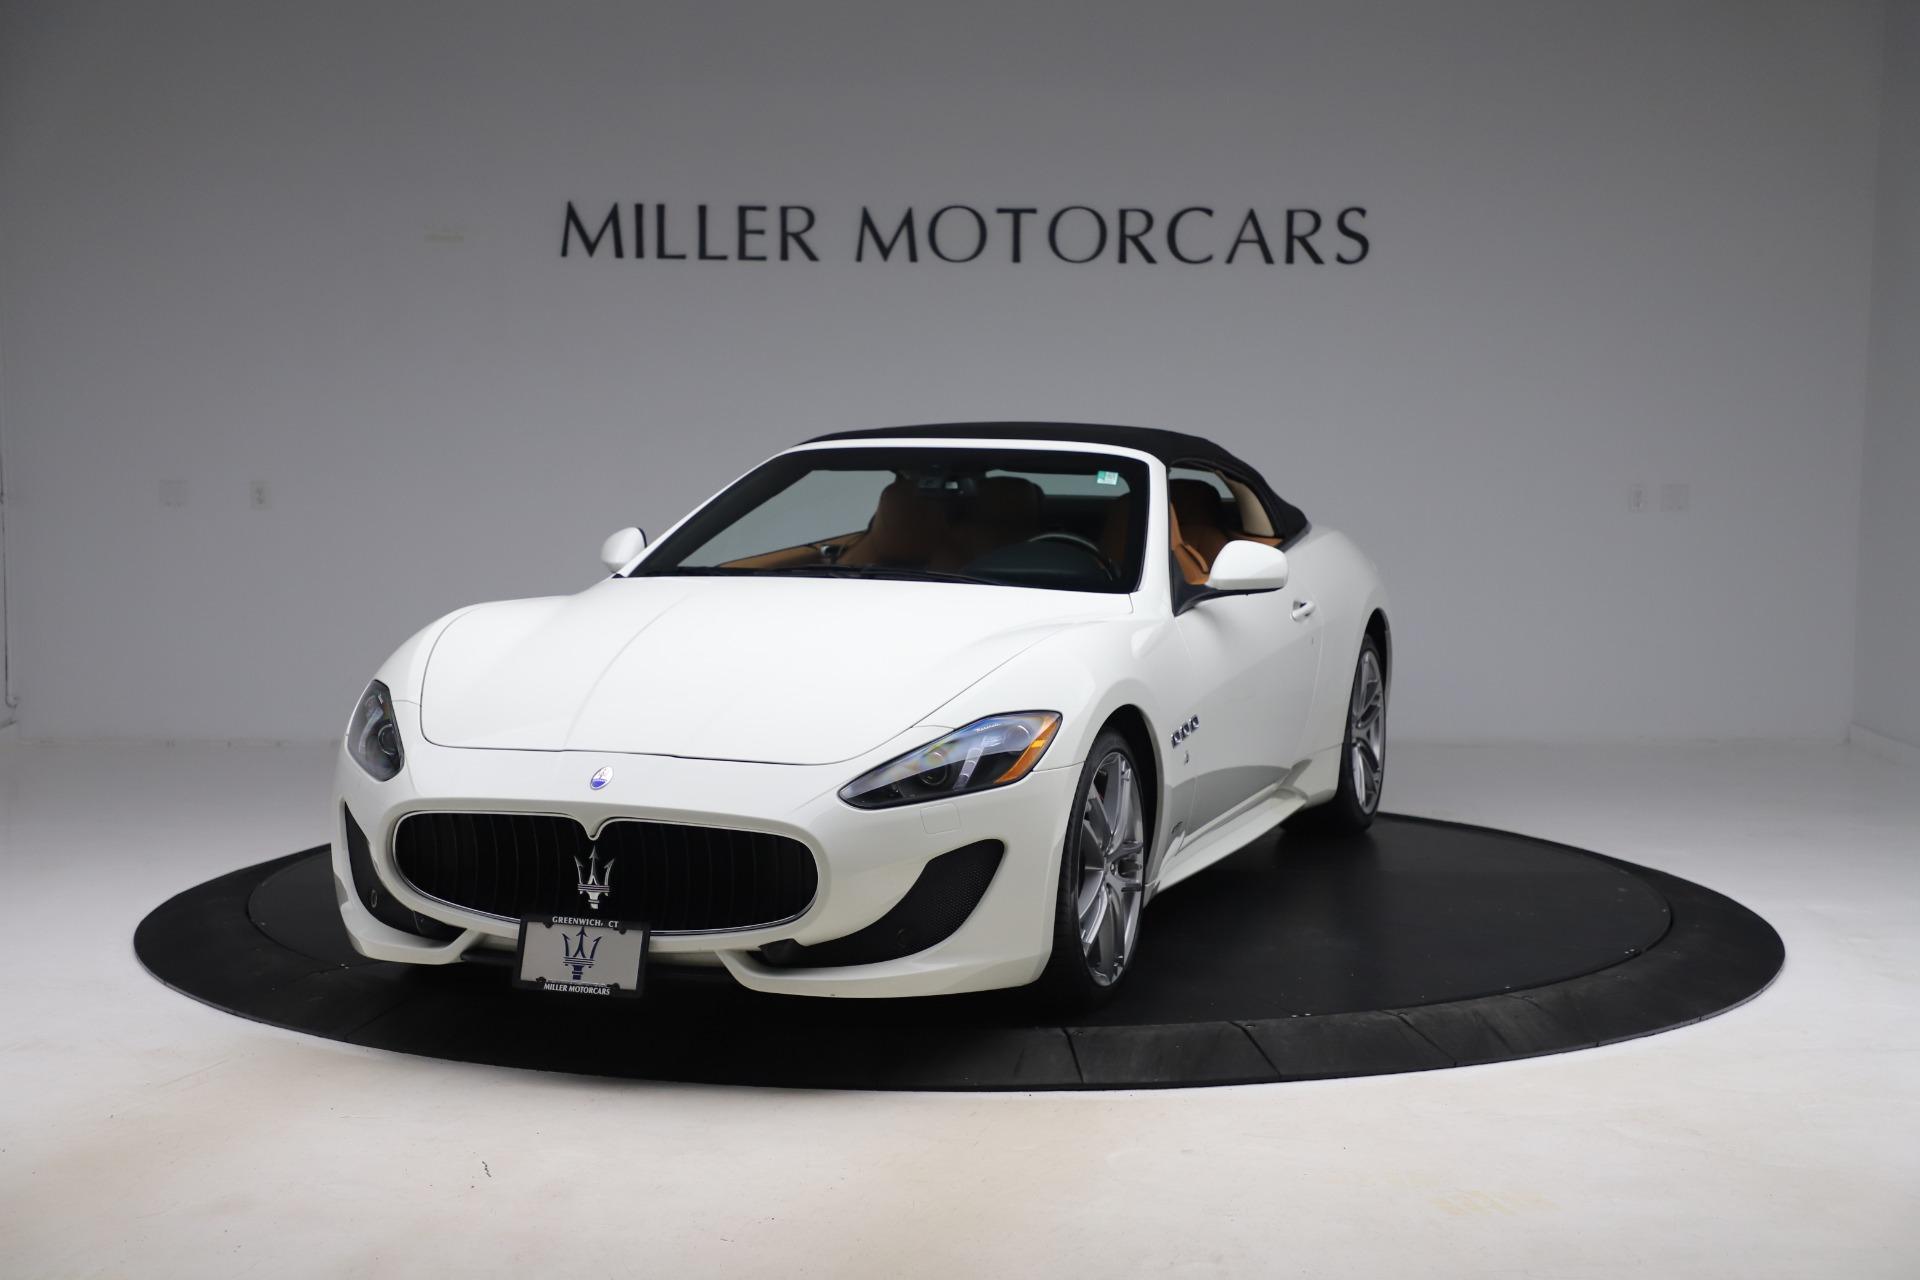 New 2017 Maserati GranTurismo Convertible Sport For Sale In Westport, CT 153_p13